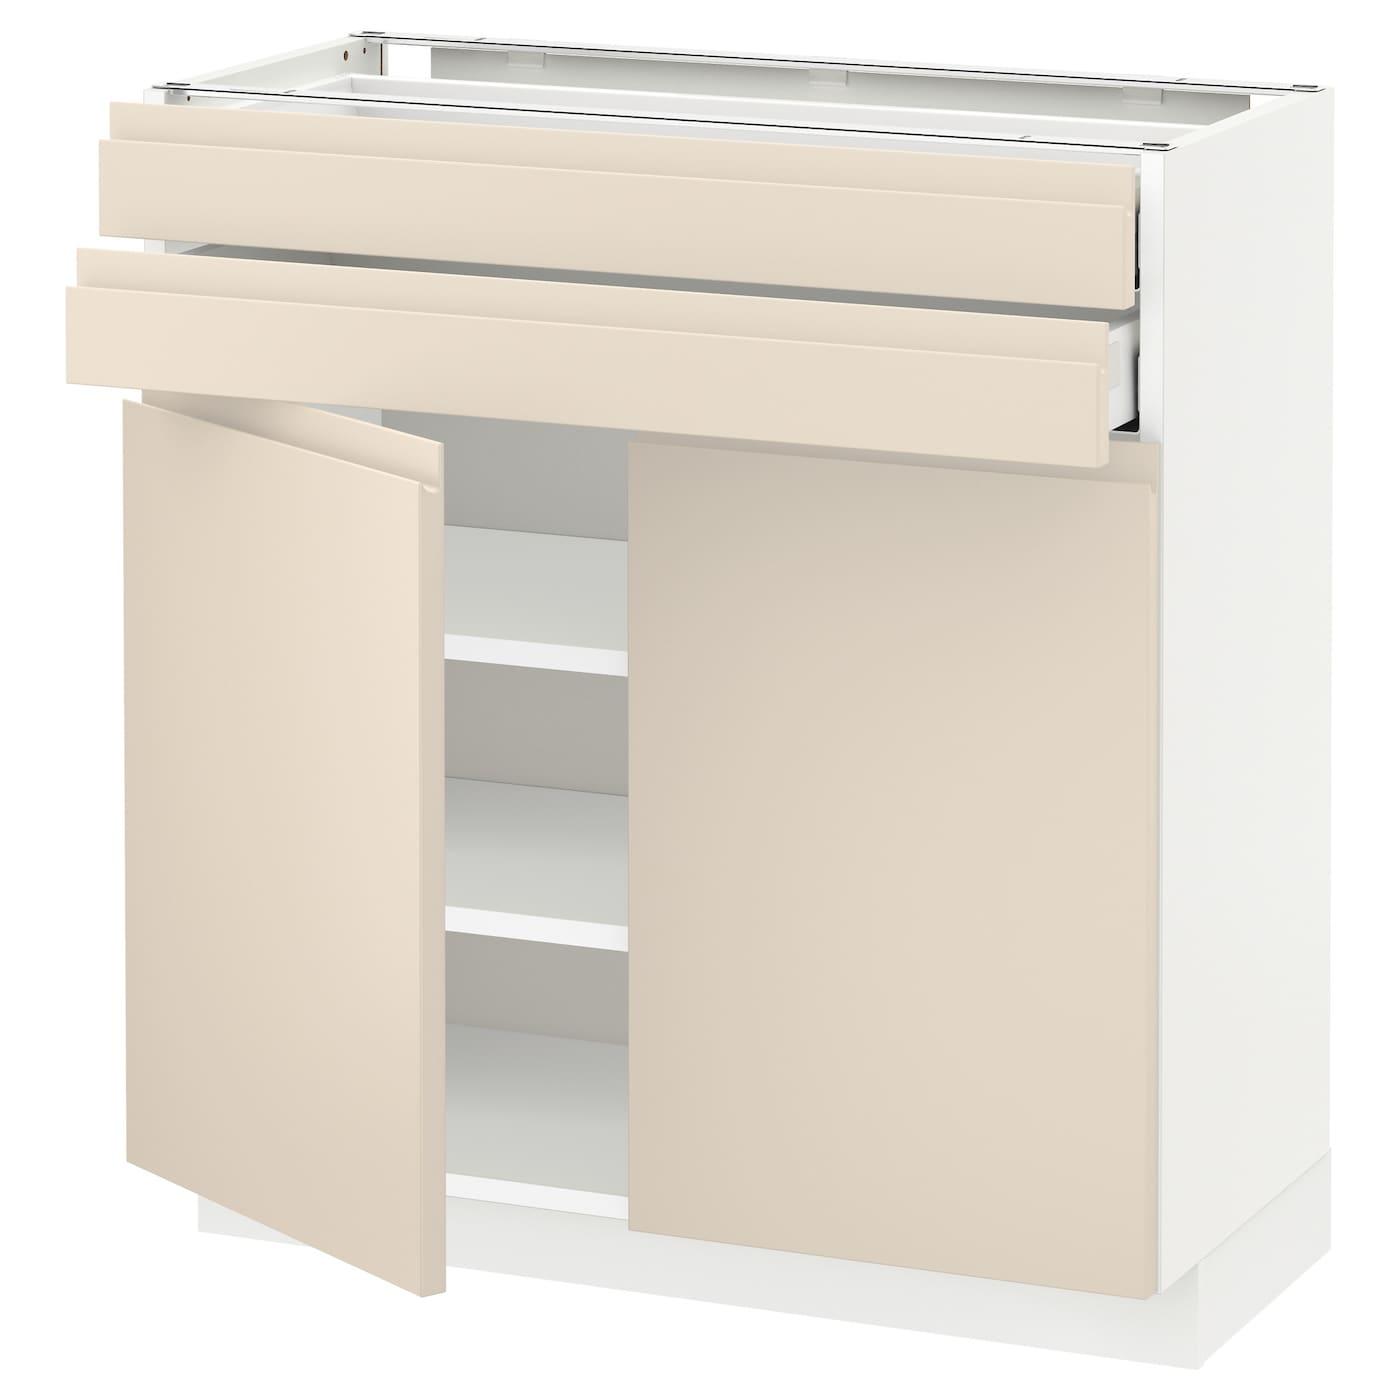 metod maximera base cabinet w 2 doors 2 drawers white voxtorp light beige 80x37 cm ikea. Black Bedroom Furniture Sets. Home Design Ideas